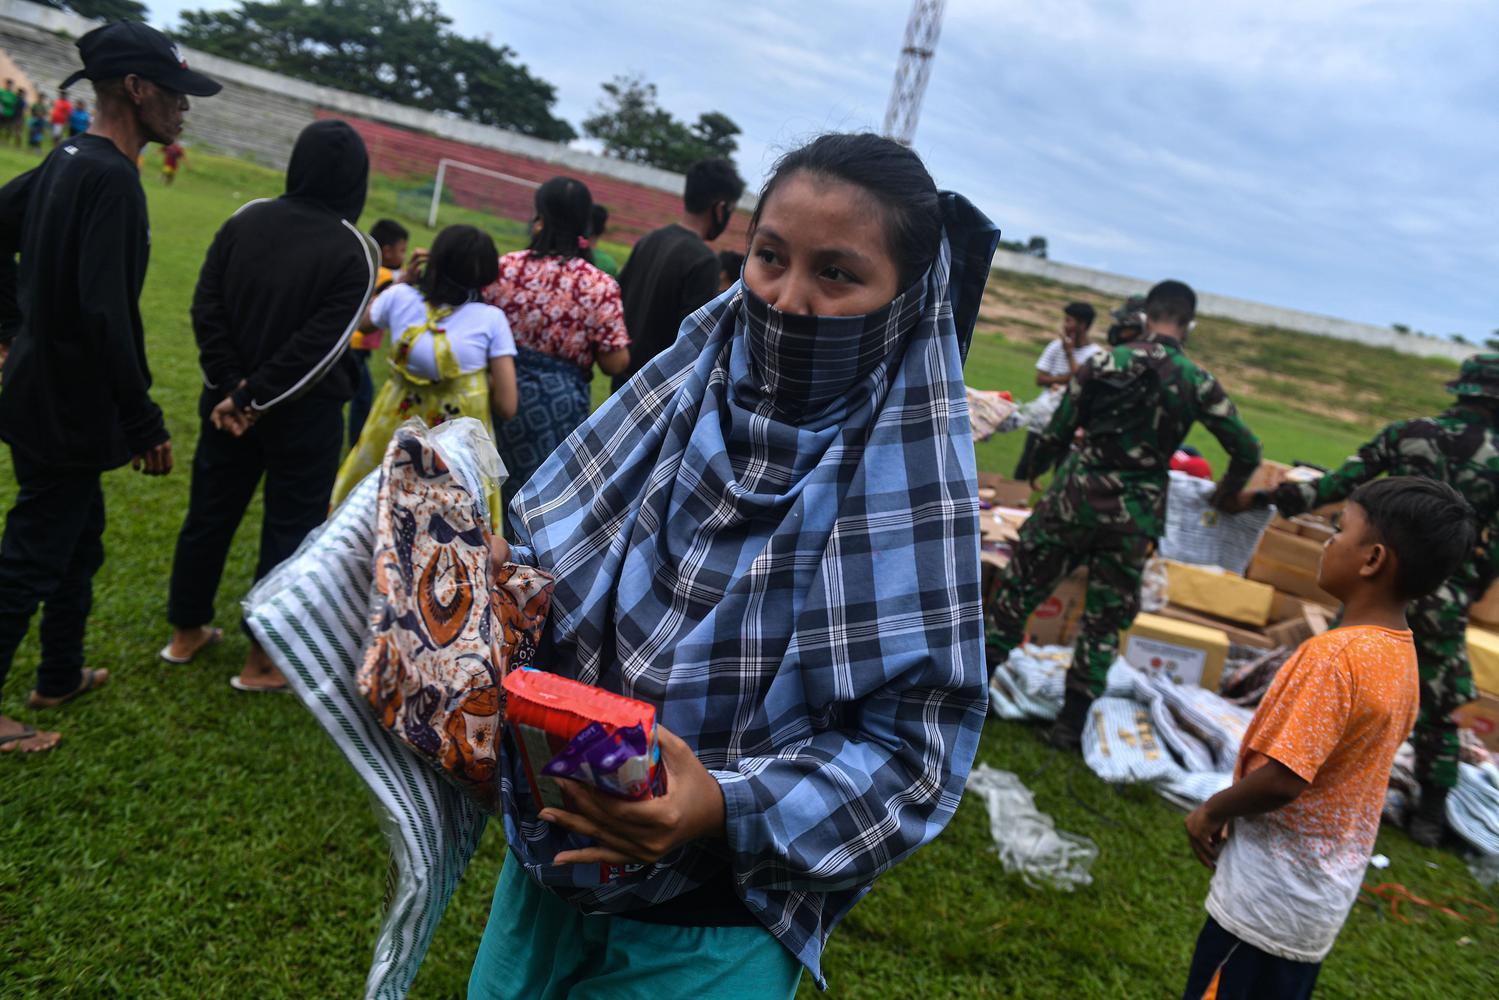 Pengungsi korban gempa membawa bantuan logistik dari TNI AD di Stadion Manakarra, Mamuju, Sulawesi Barat, Minggu (17/1/2021). Berdasarkan data BNPB per 17 Januari pukul 14.00 WIB, jumlah korban meninggal dunia akibat gempa bumi magnitudo 6,2 di Sulawesi Barat telah mencapai 73 orang.